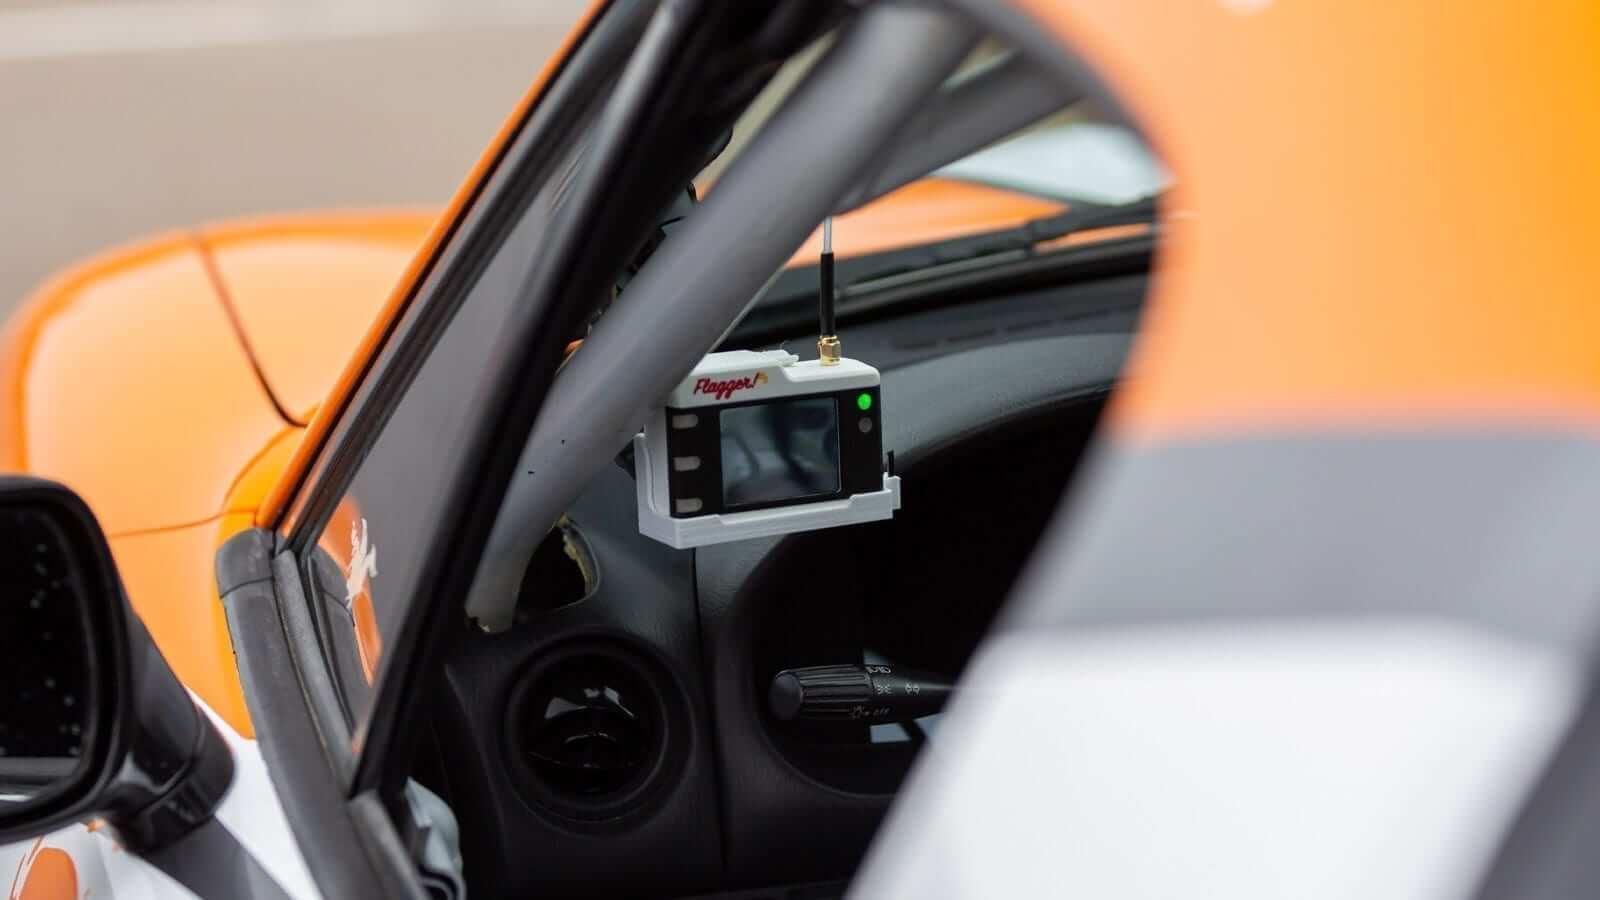 flagger web2 - Flagger In-Car Alert System